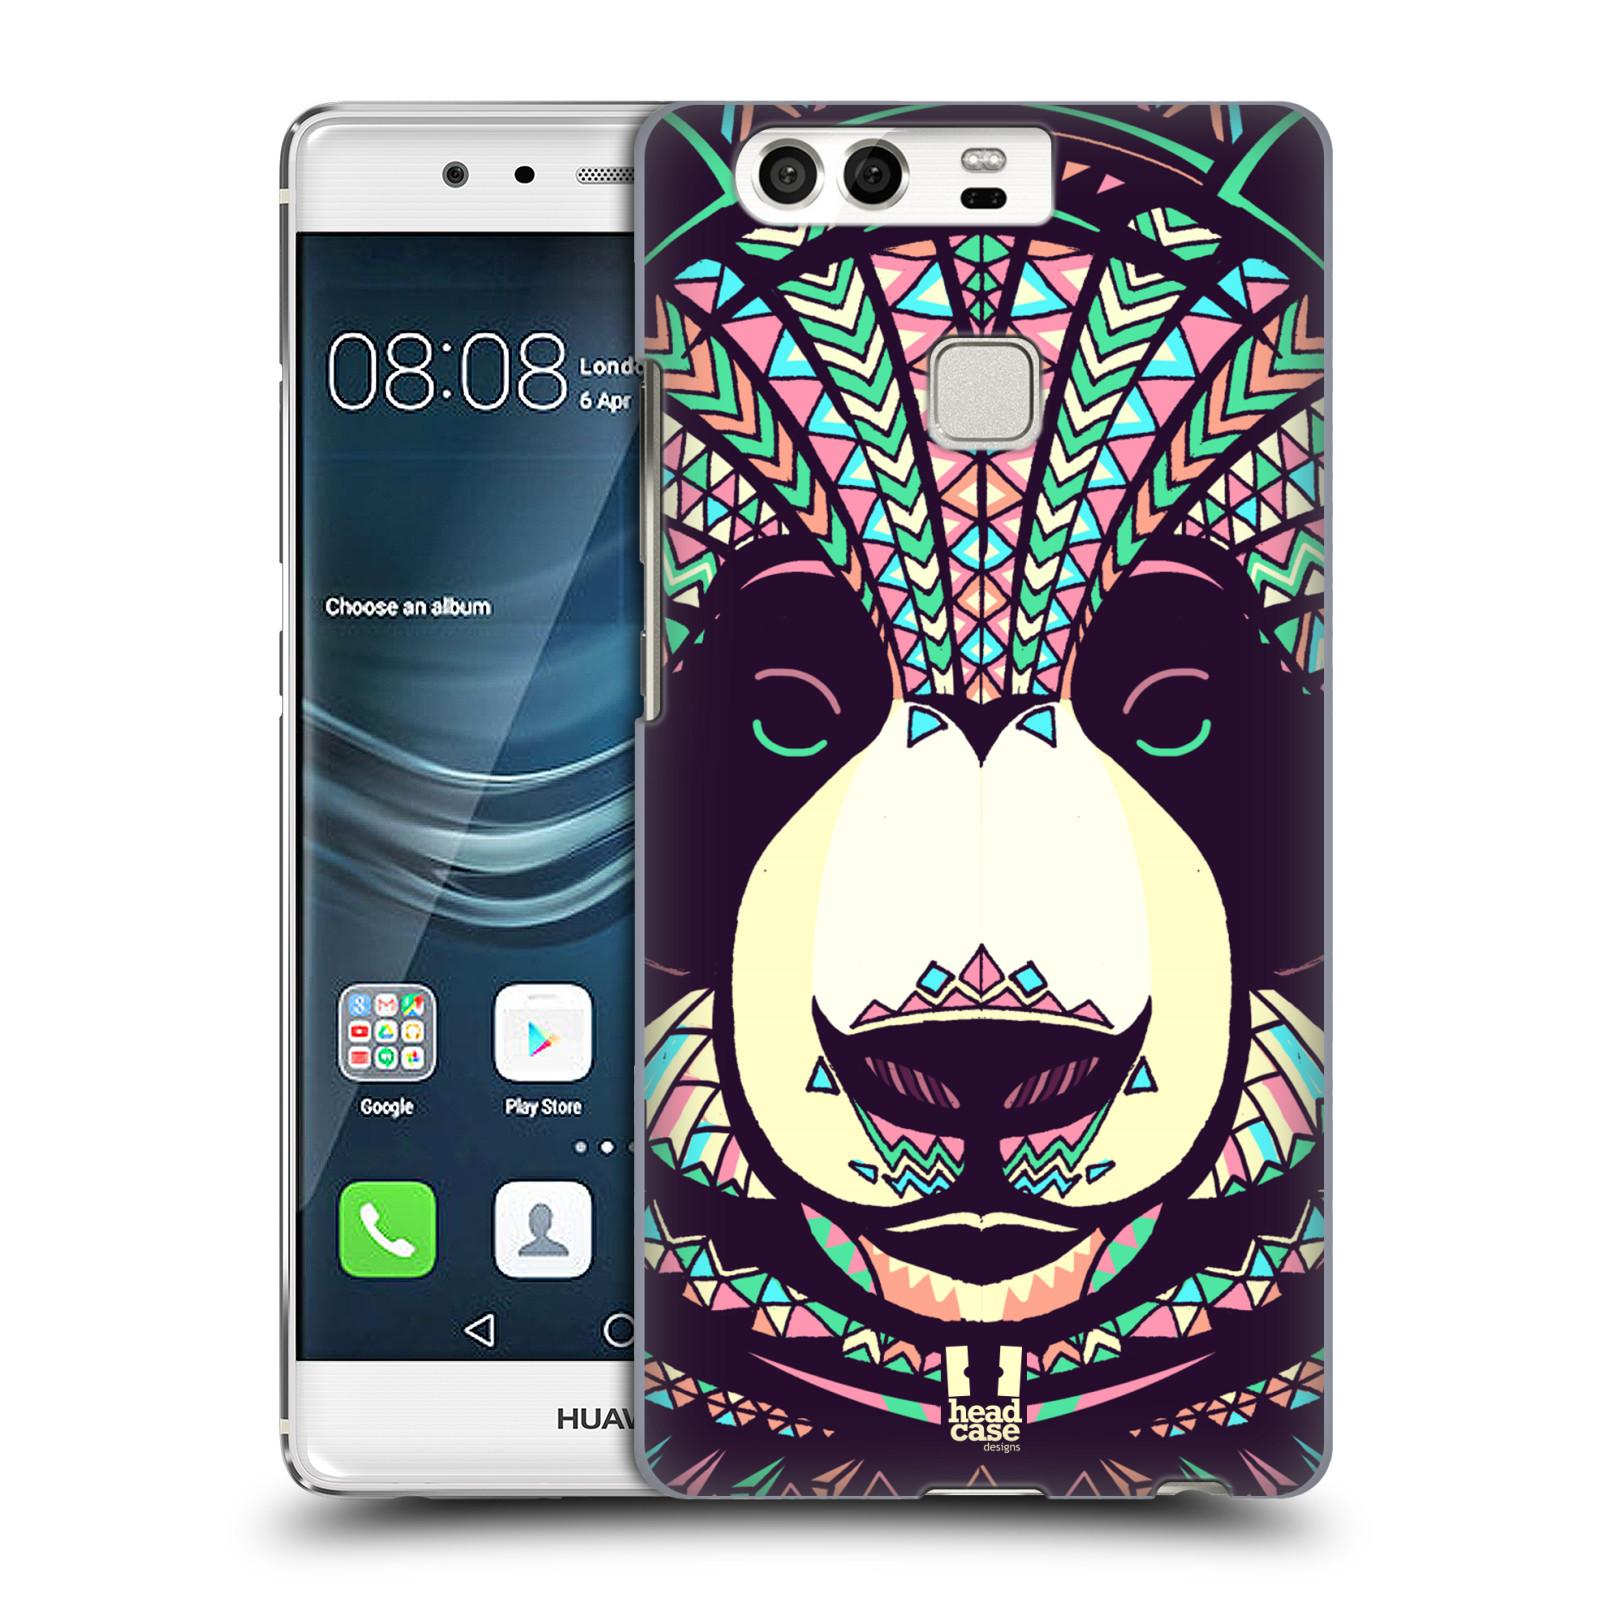 HEAD CASE plastový obal na mobil Huawei P9 / P9 DUAL SIM vzor Aztécký motiv zvíře 3 panda